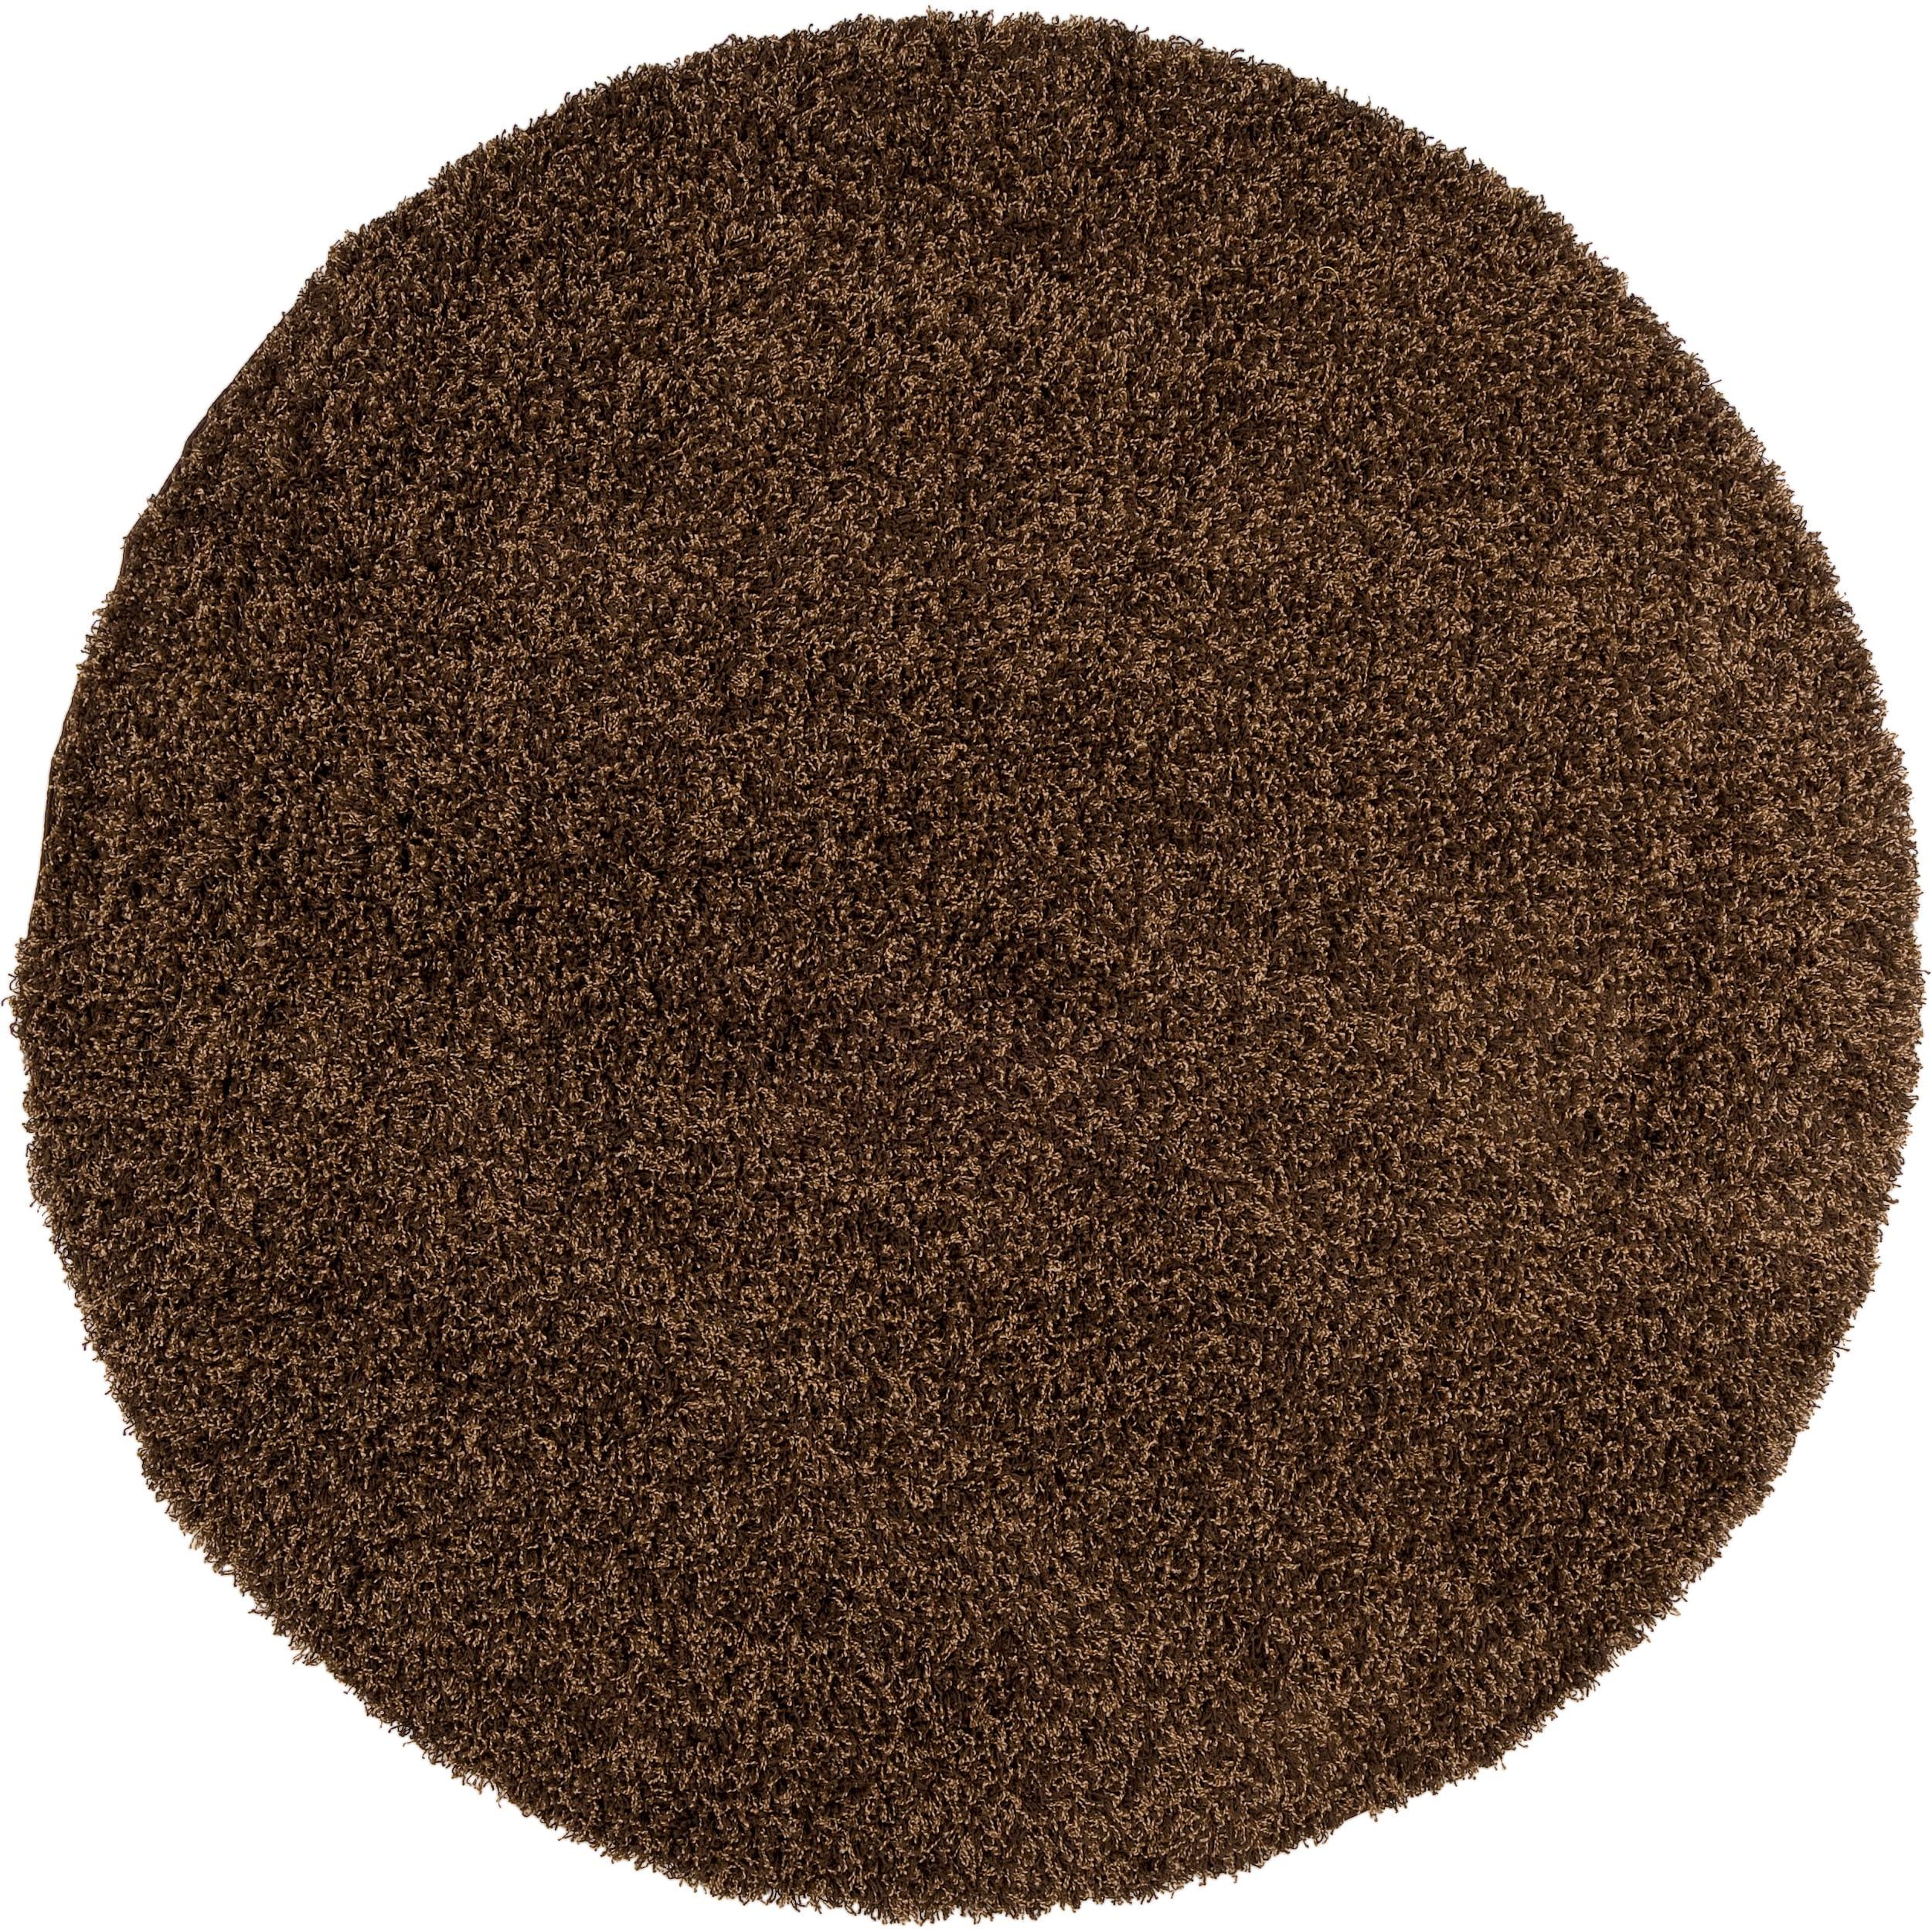 Woven Brown Conch Plush Shag (8' Round)